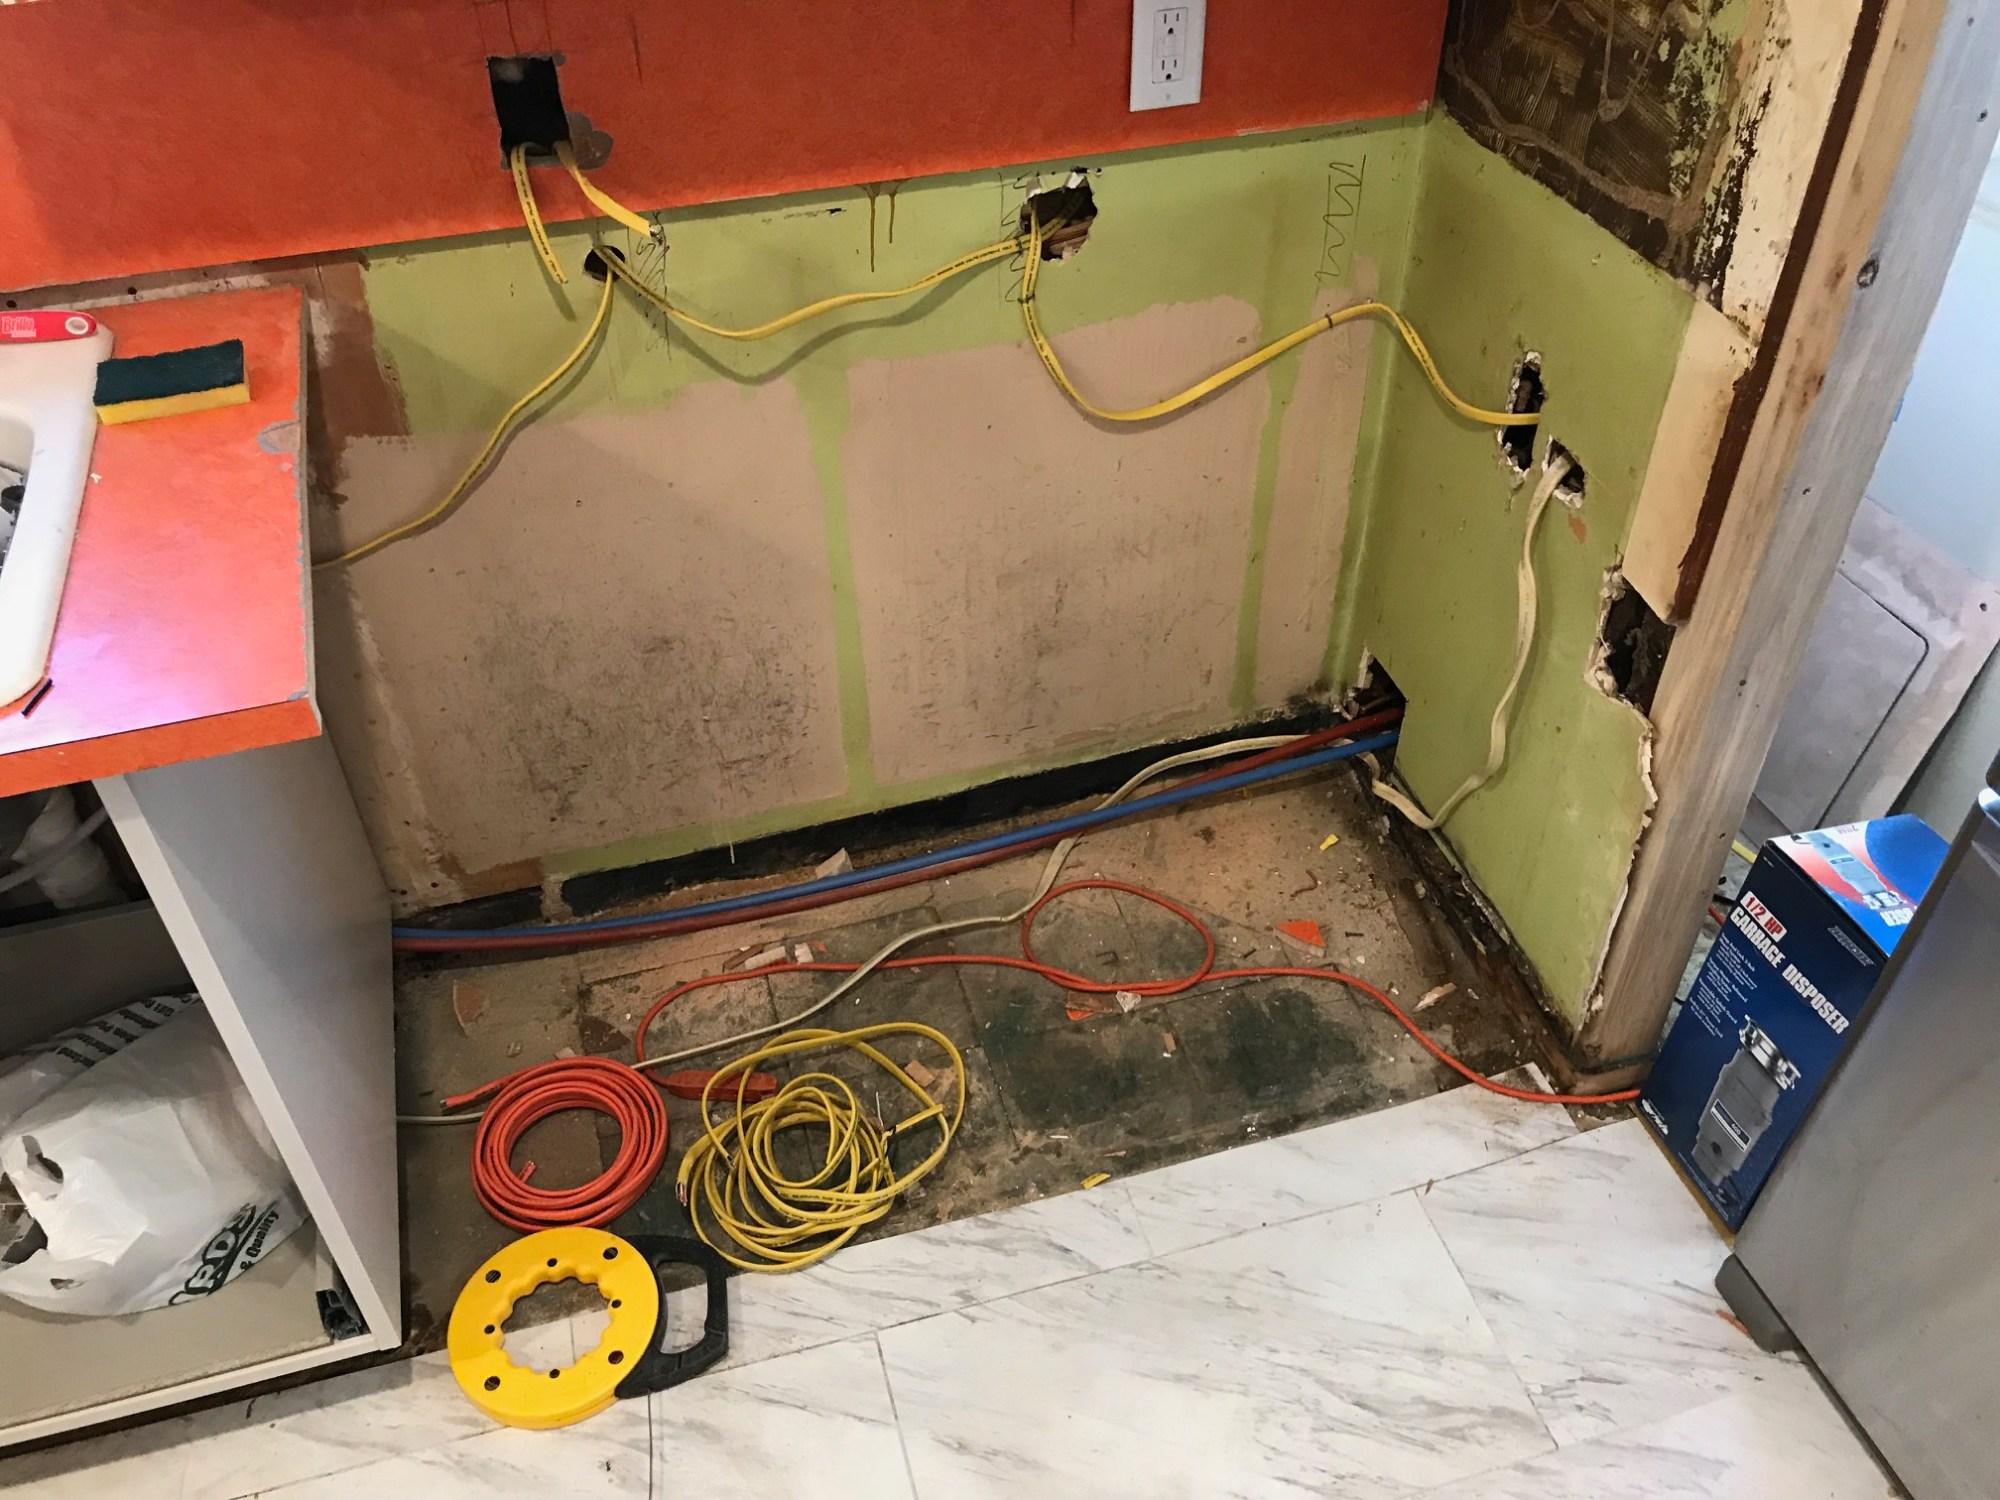 hight resolution of diy kitchen plumbing and wiring renovation